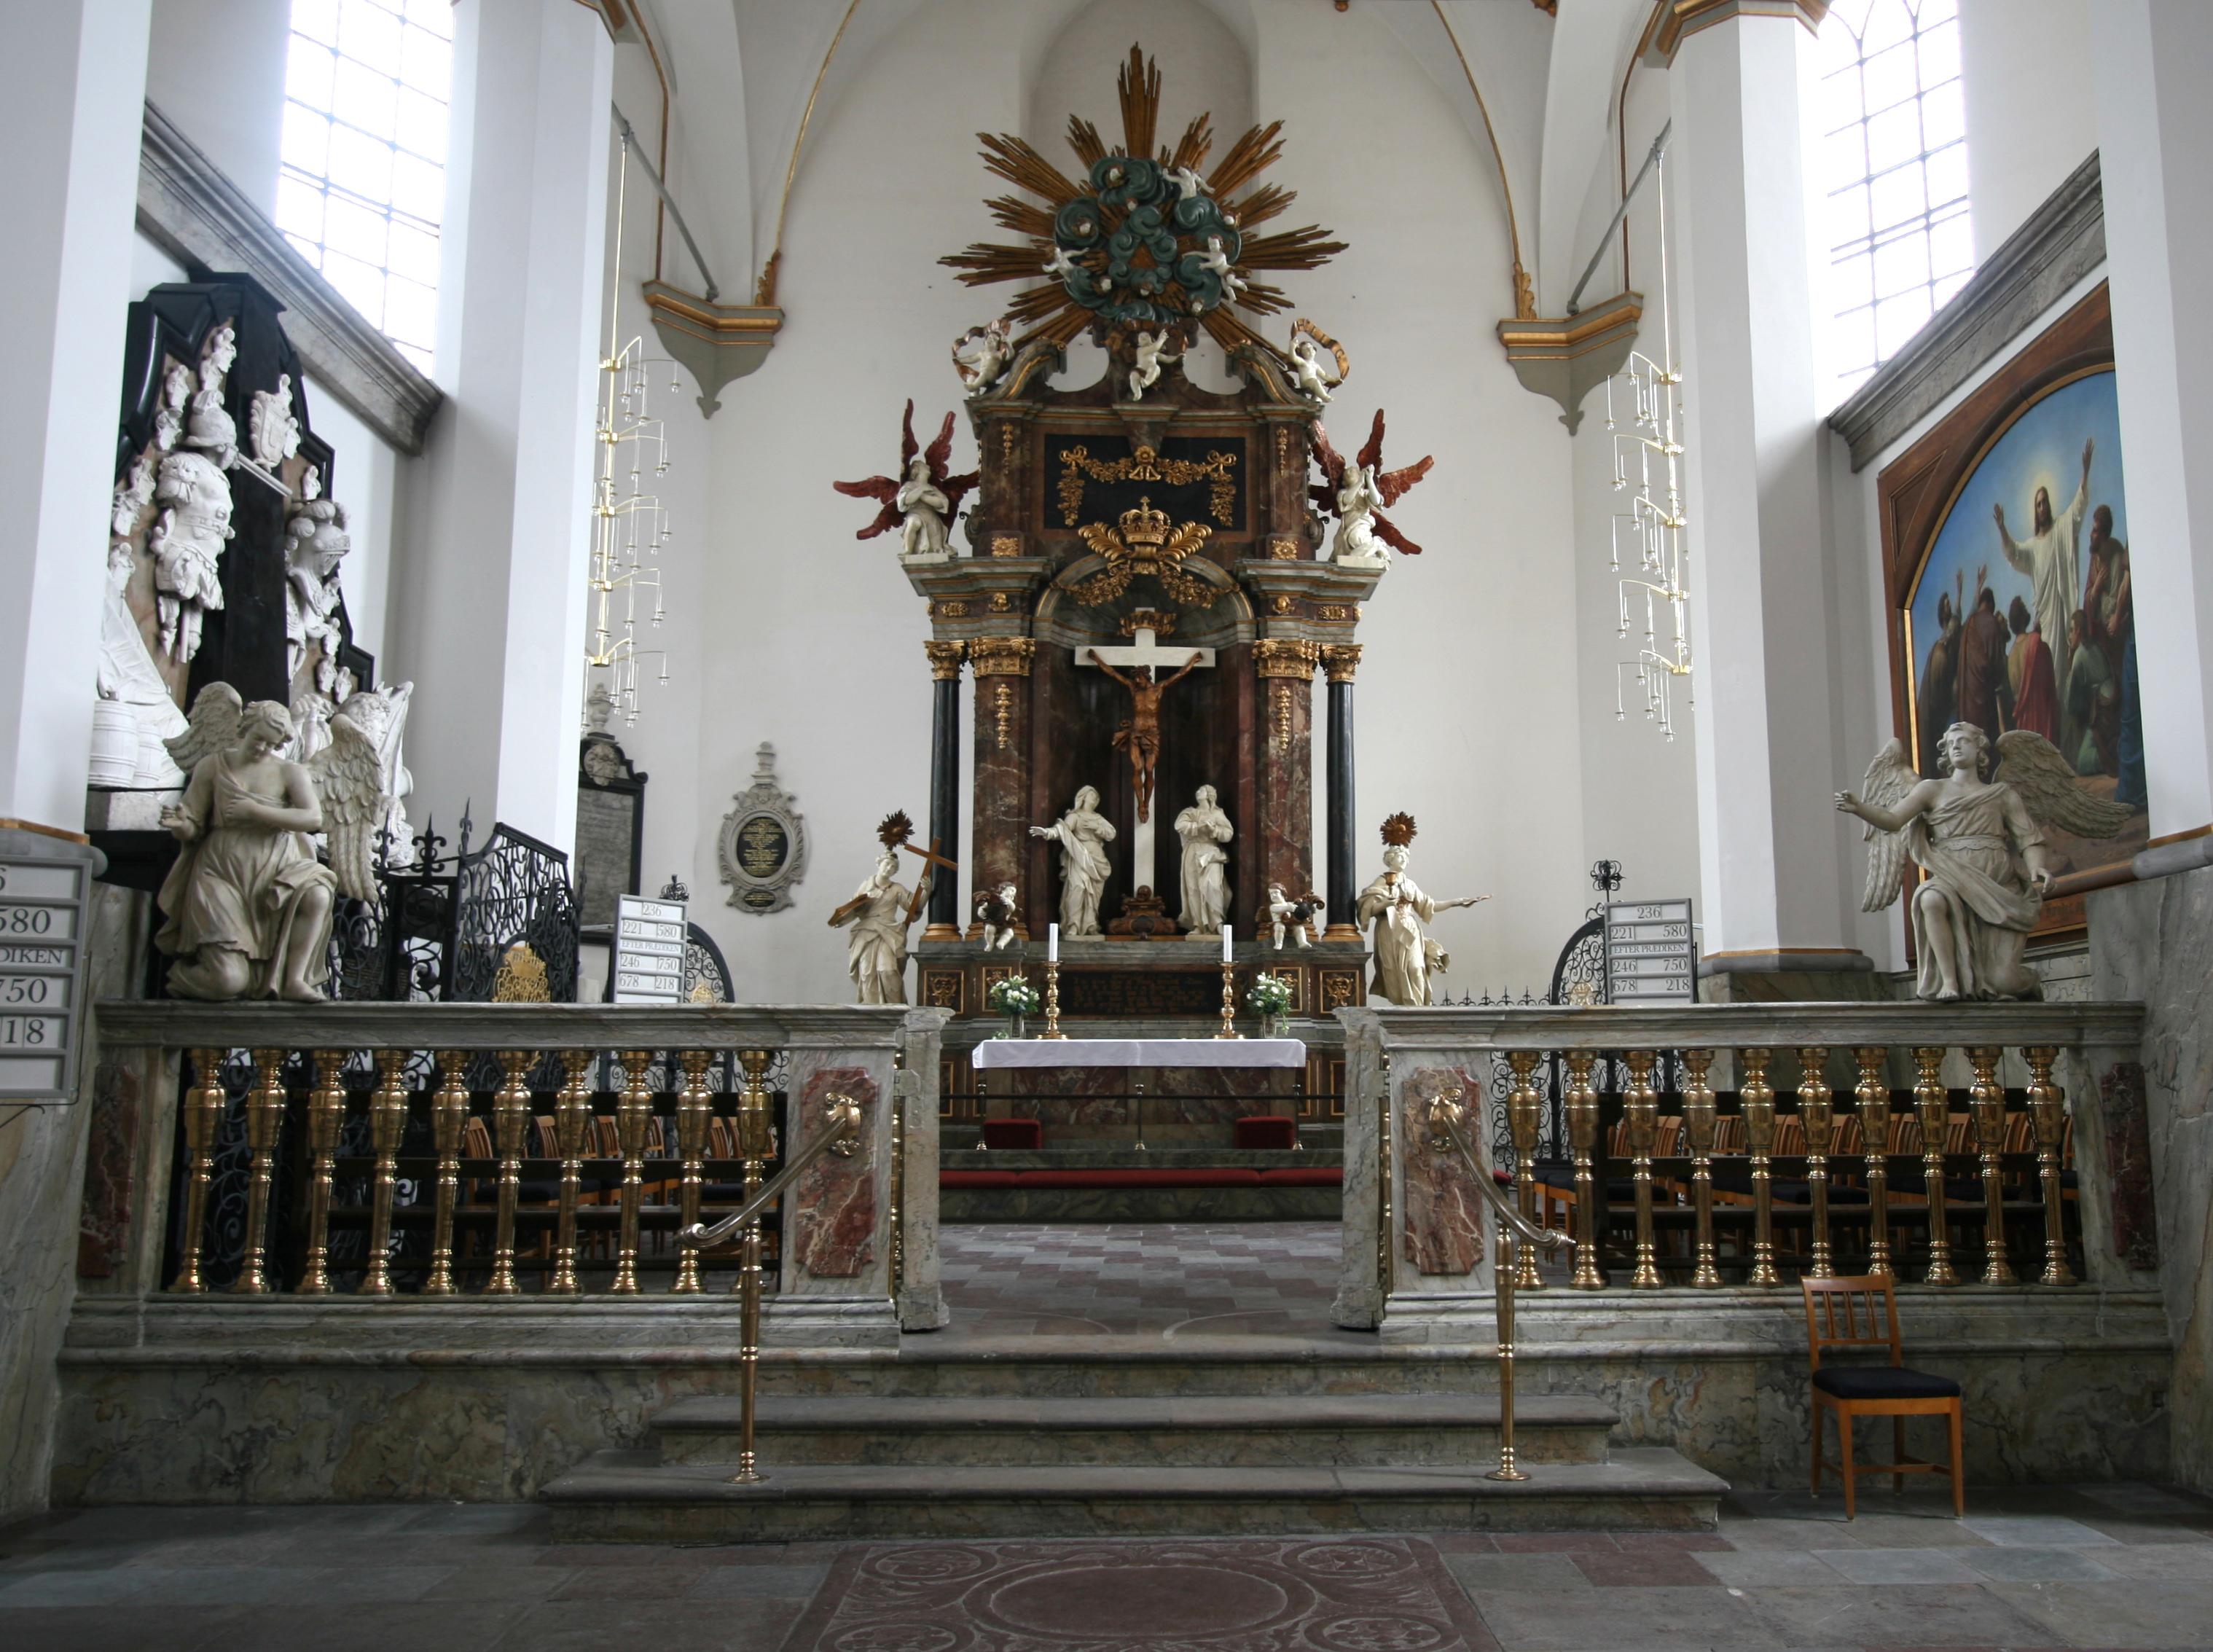 File:Trinitatis Kirke Copenhagen quire.jpg.